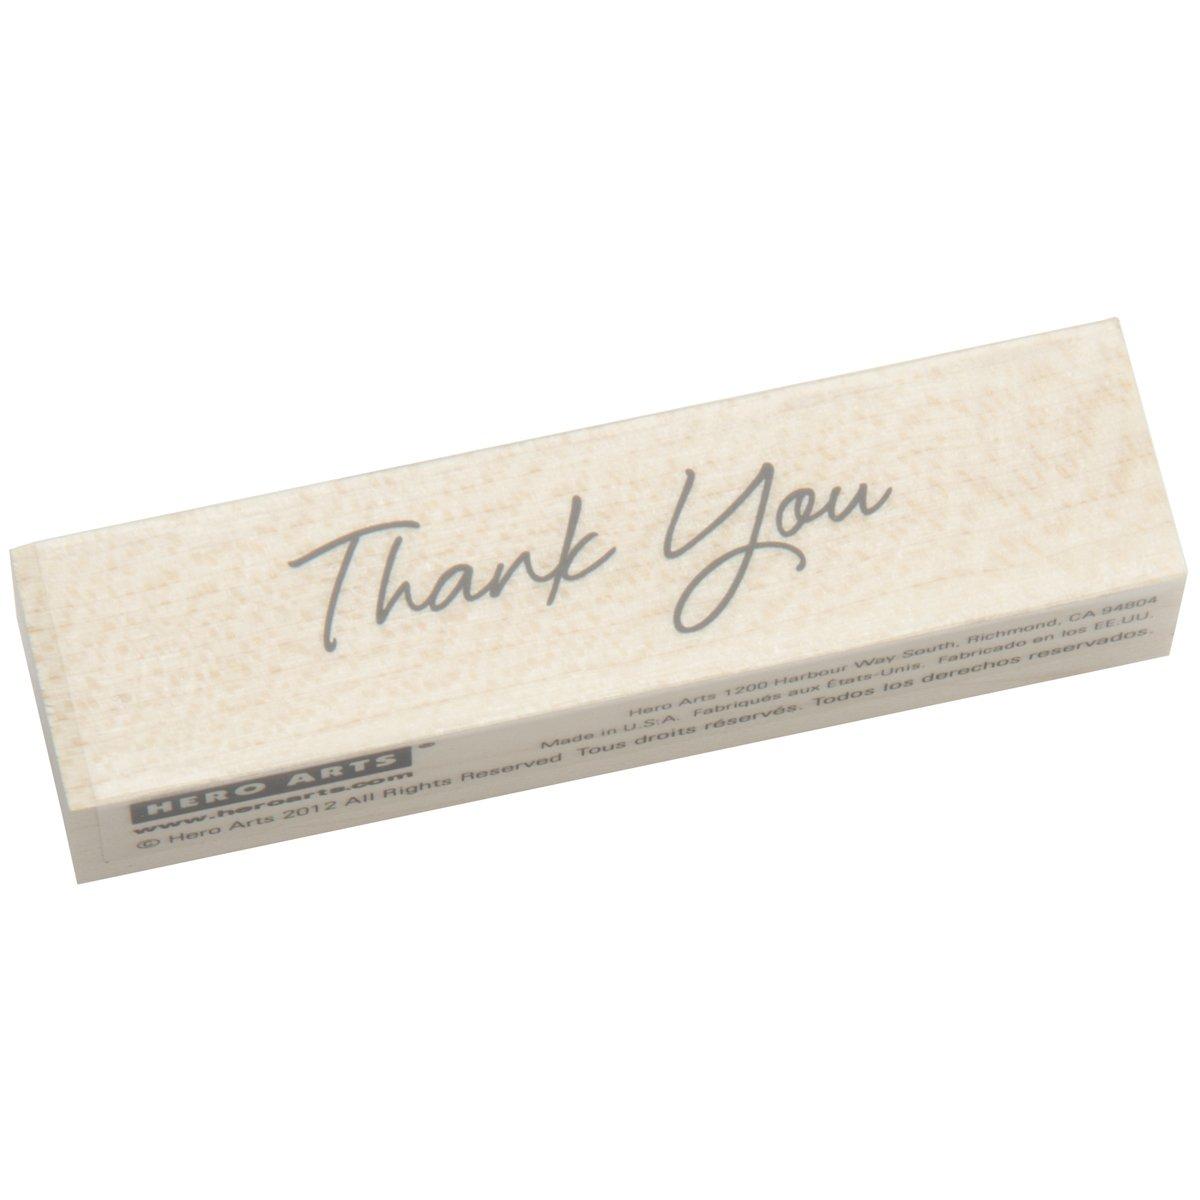 Hero Arts Woodblock Stamp, Little Greetings Thank You Inc. C5589